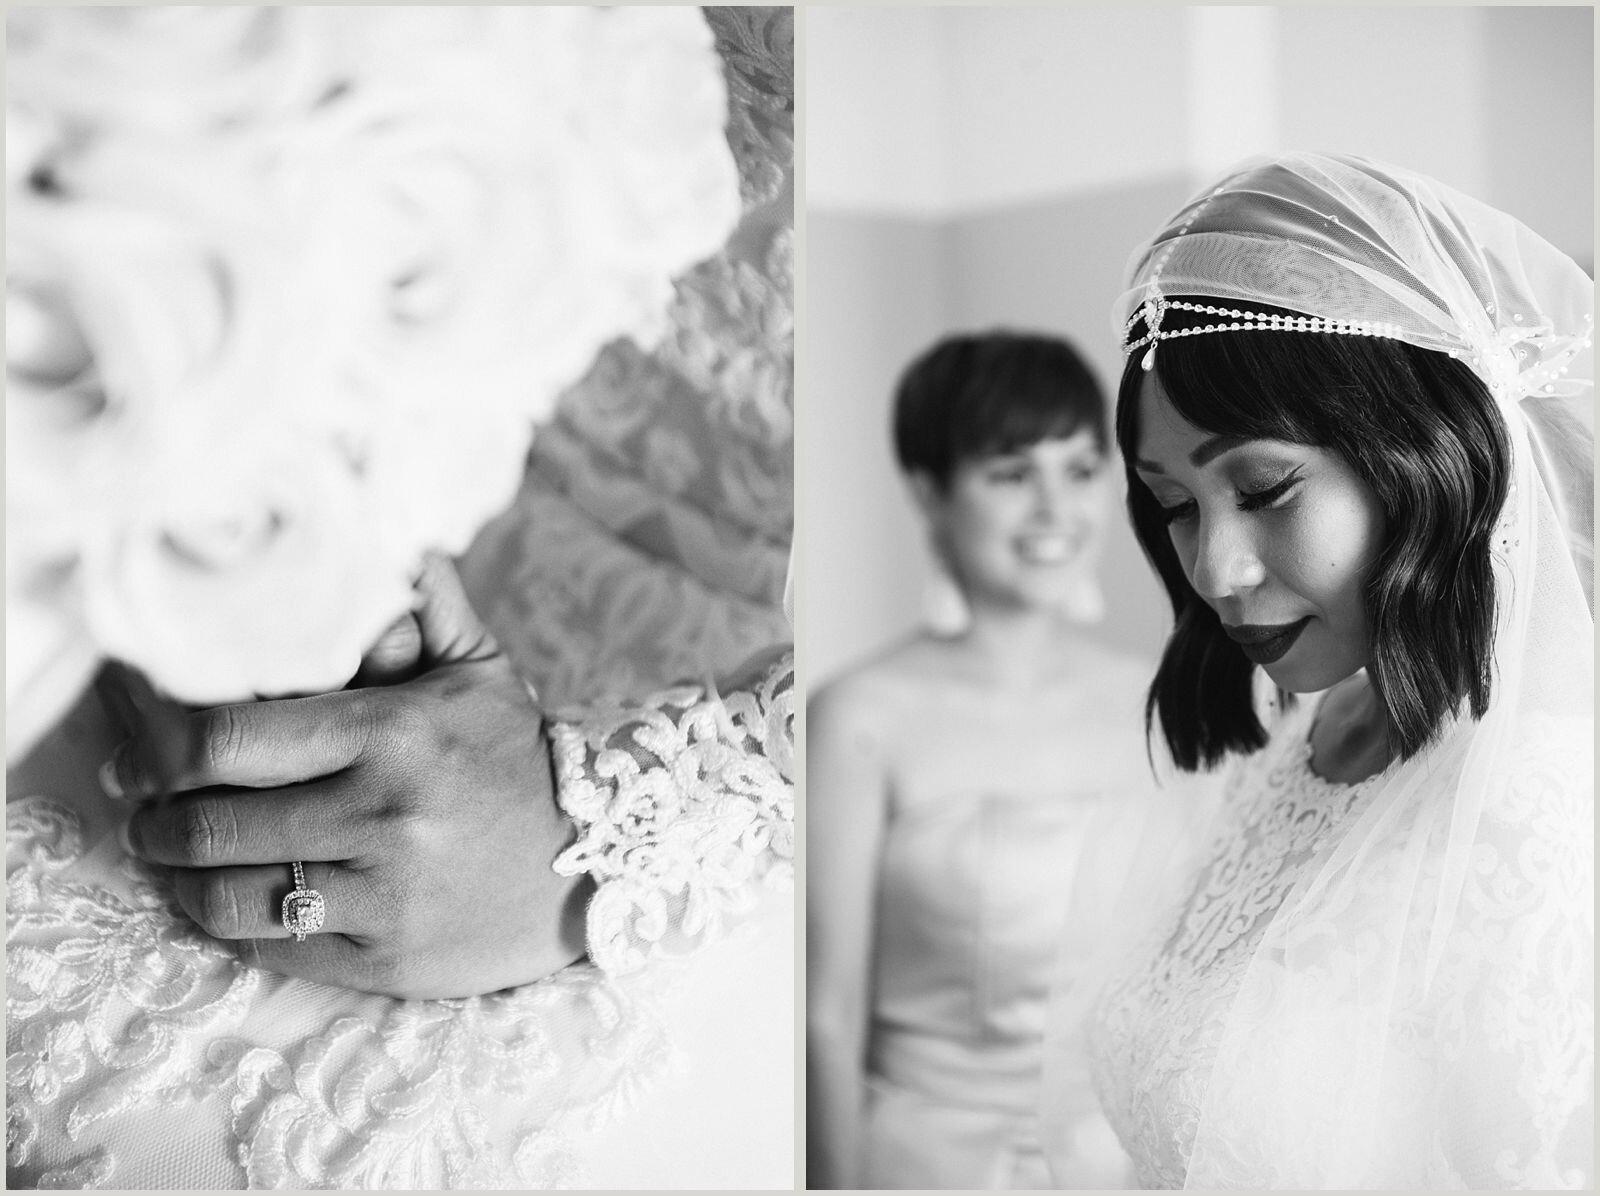 joseph_koprek_wedding_melbourne_the_prince_deck_0016.jpg